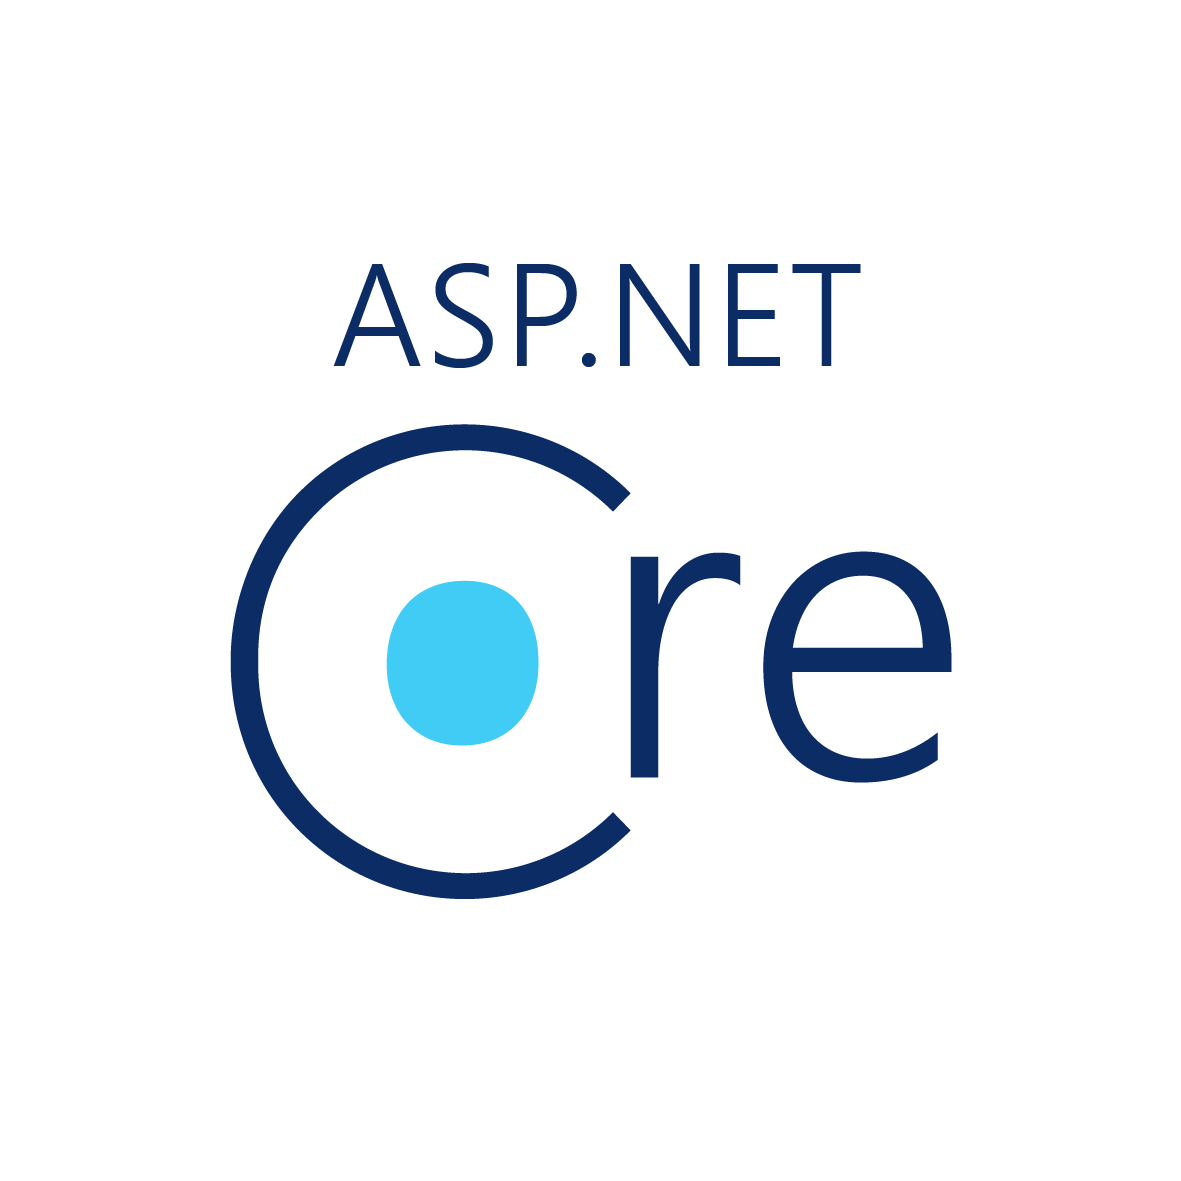 https://raw.githubusercontent.com/campusMVP/dotnetCoreLogoPack/master/ASP.NET%20Core/Bitmap%20RGB/Bitmap-BIG_ASP.NET-Core-Logo_2colors_Square_RGB.png